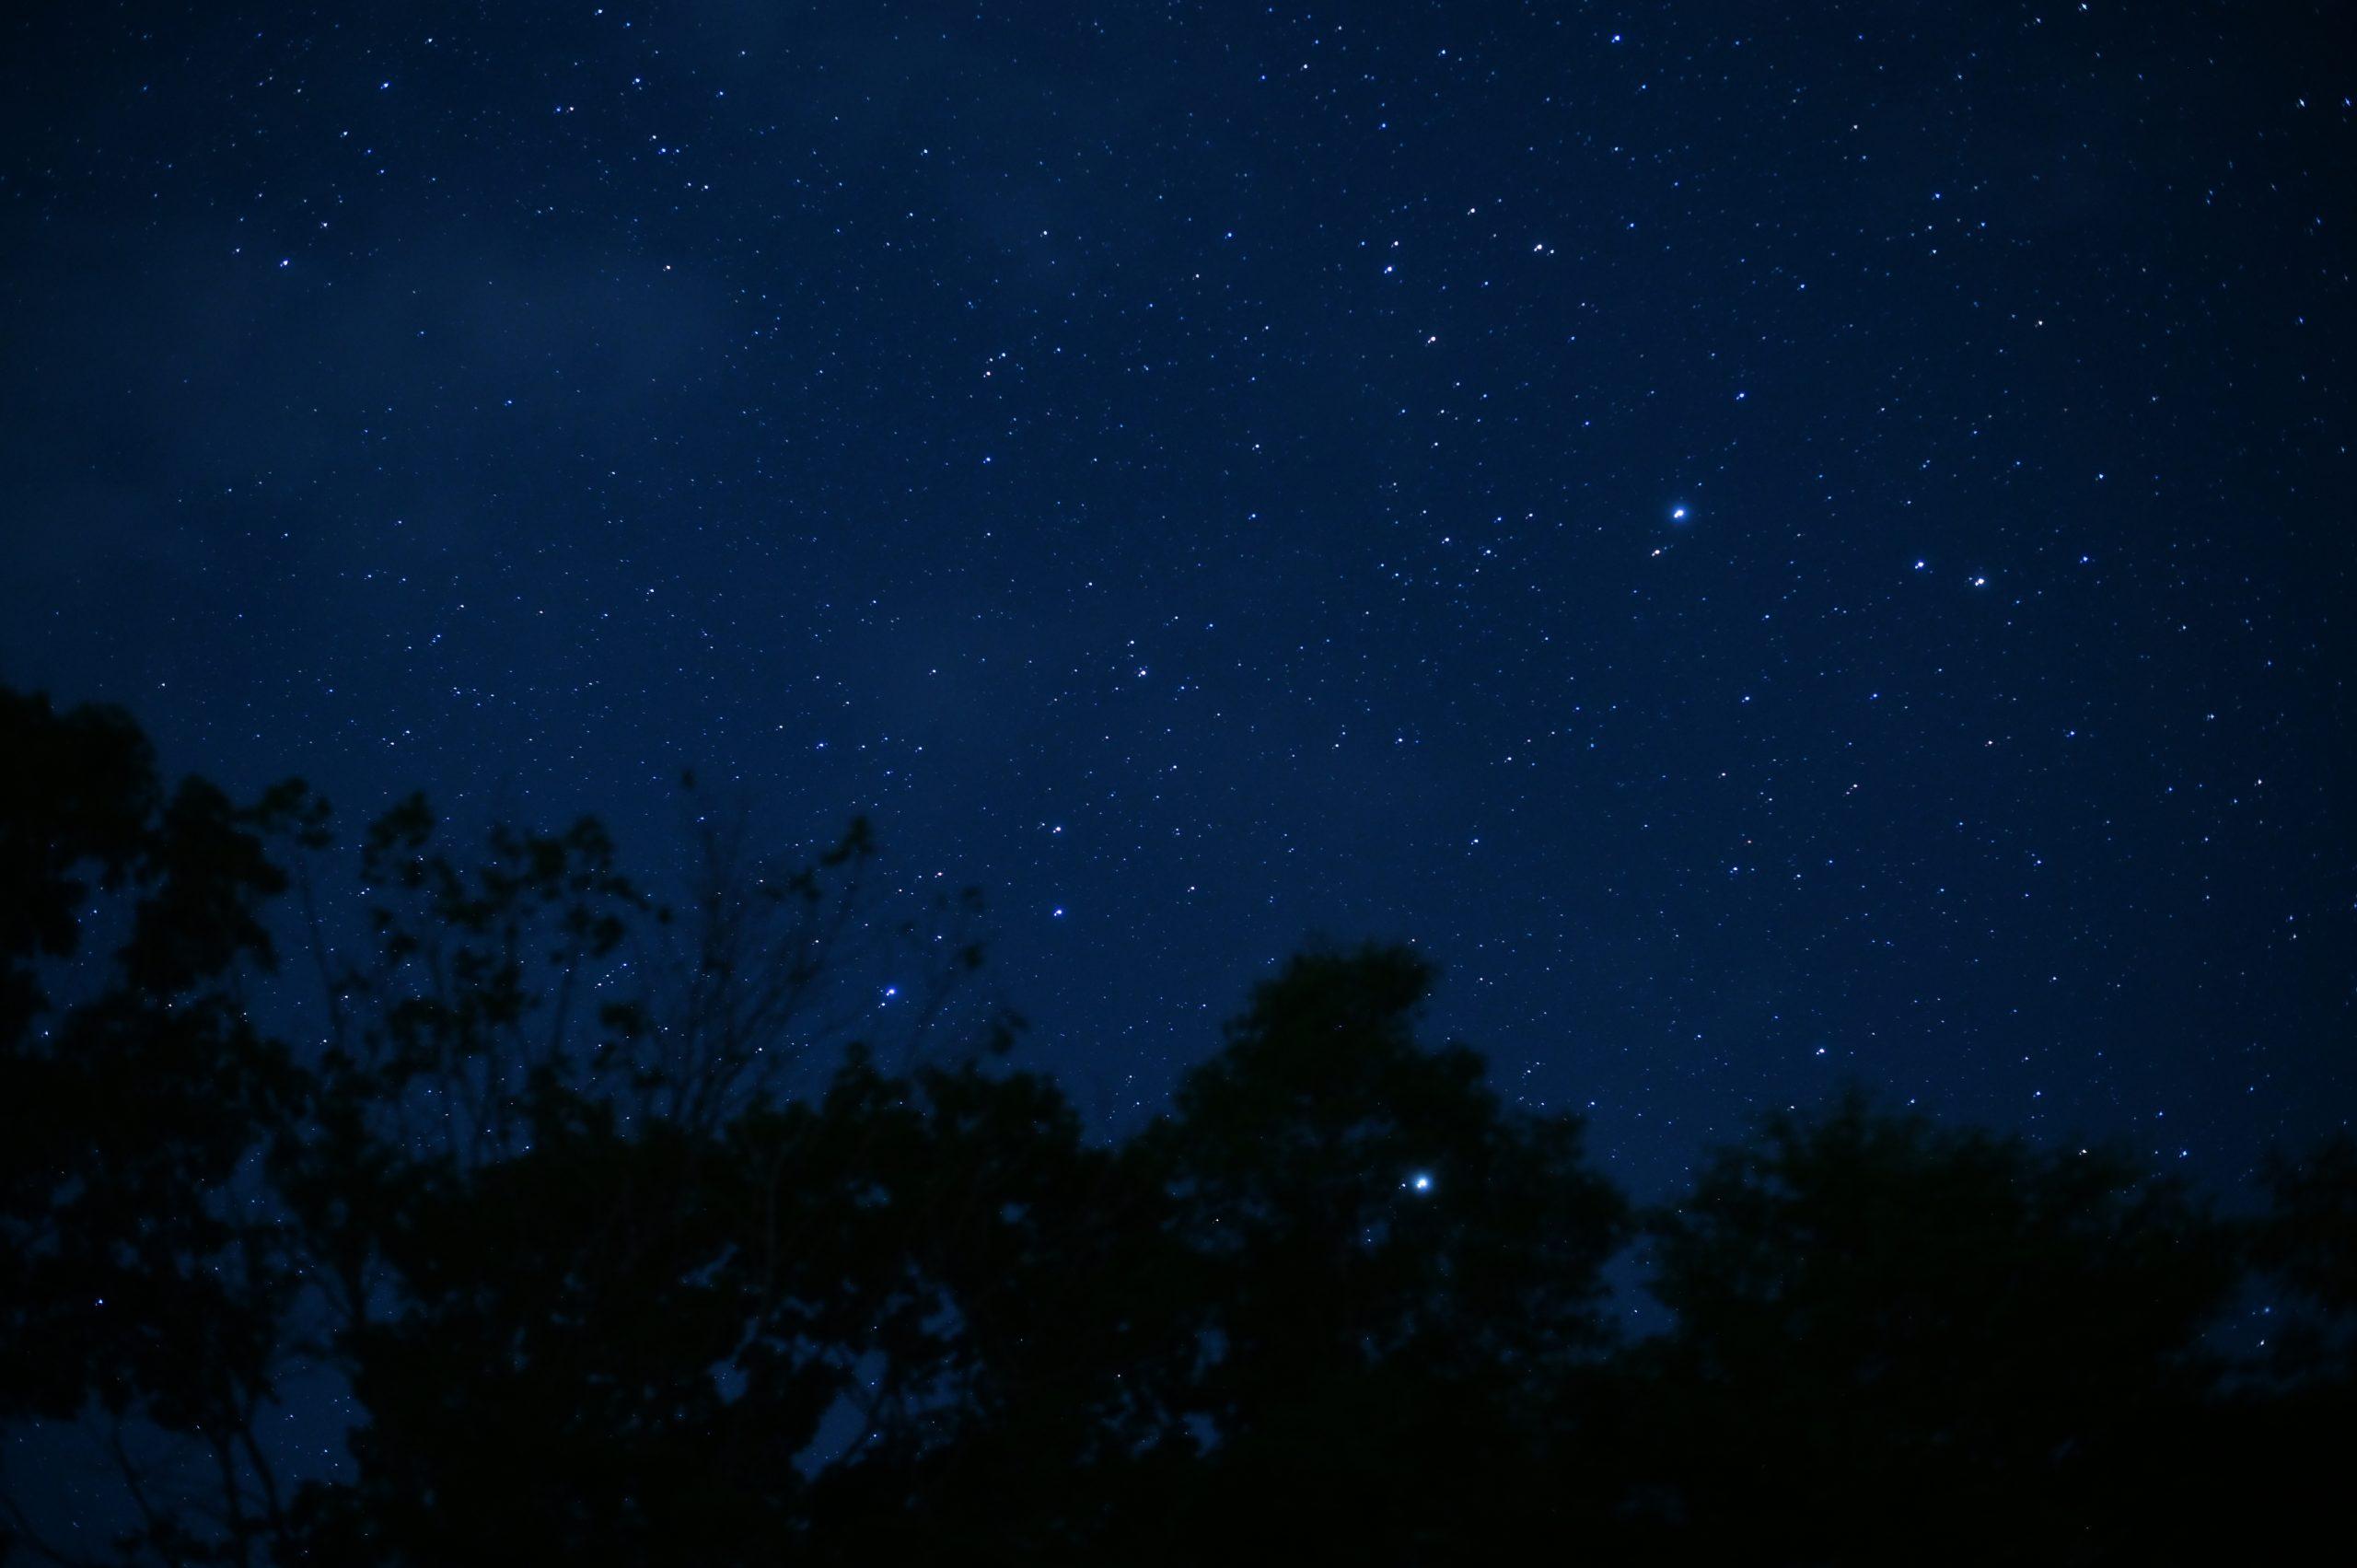 【Kenko】ソフトフィルター「PRO1D PROSOFTON Clear」で夜景に挑戦